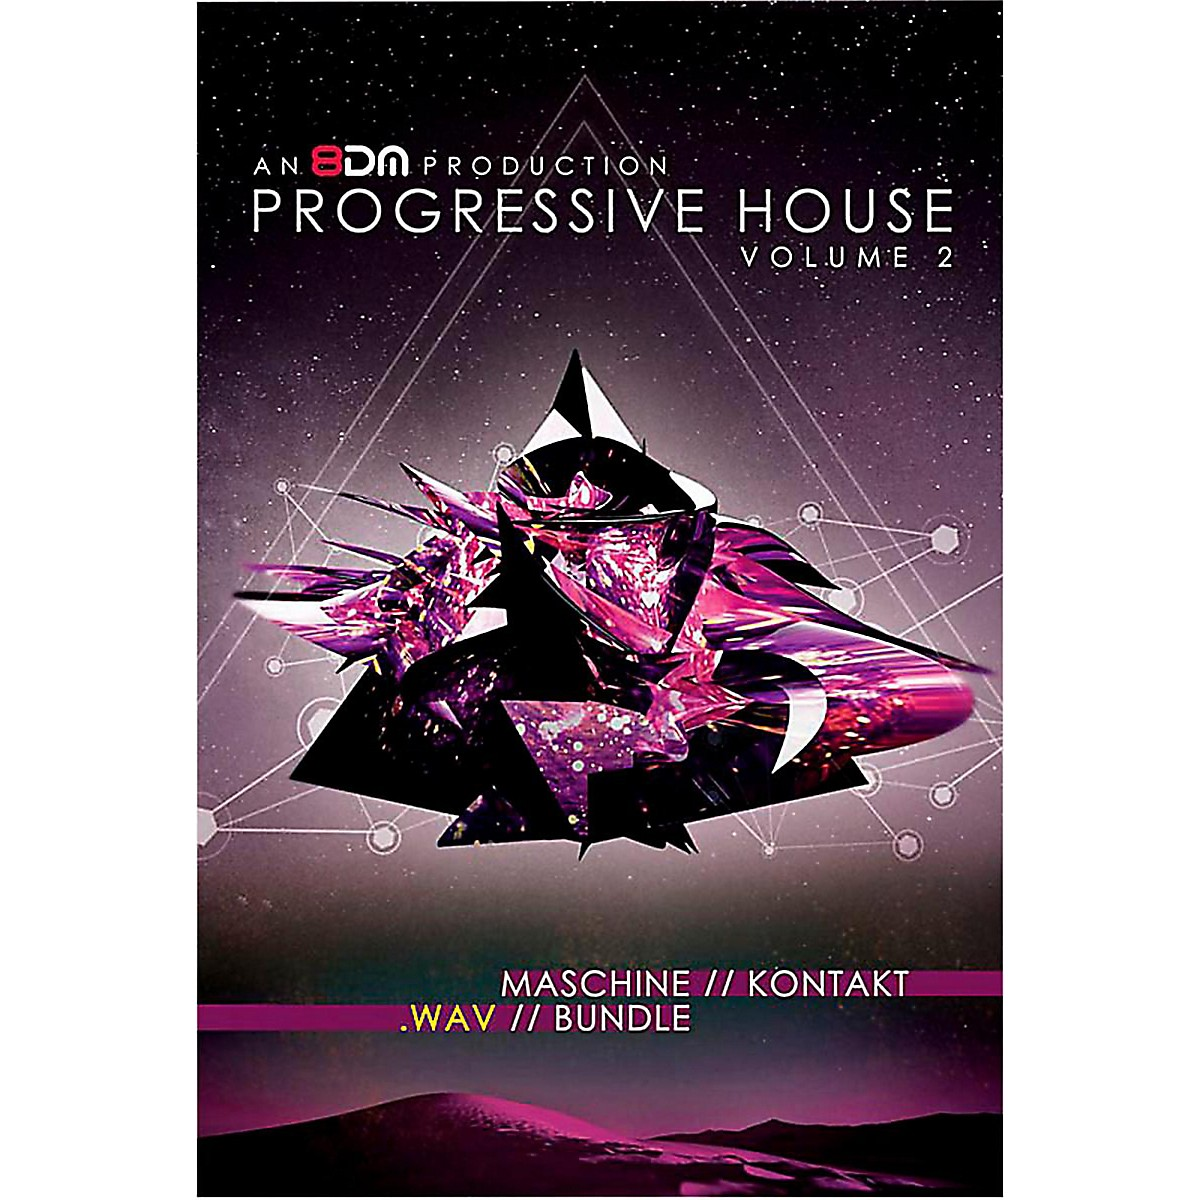 8DM Progressive House Vol 2 Wav-Pack